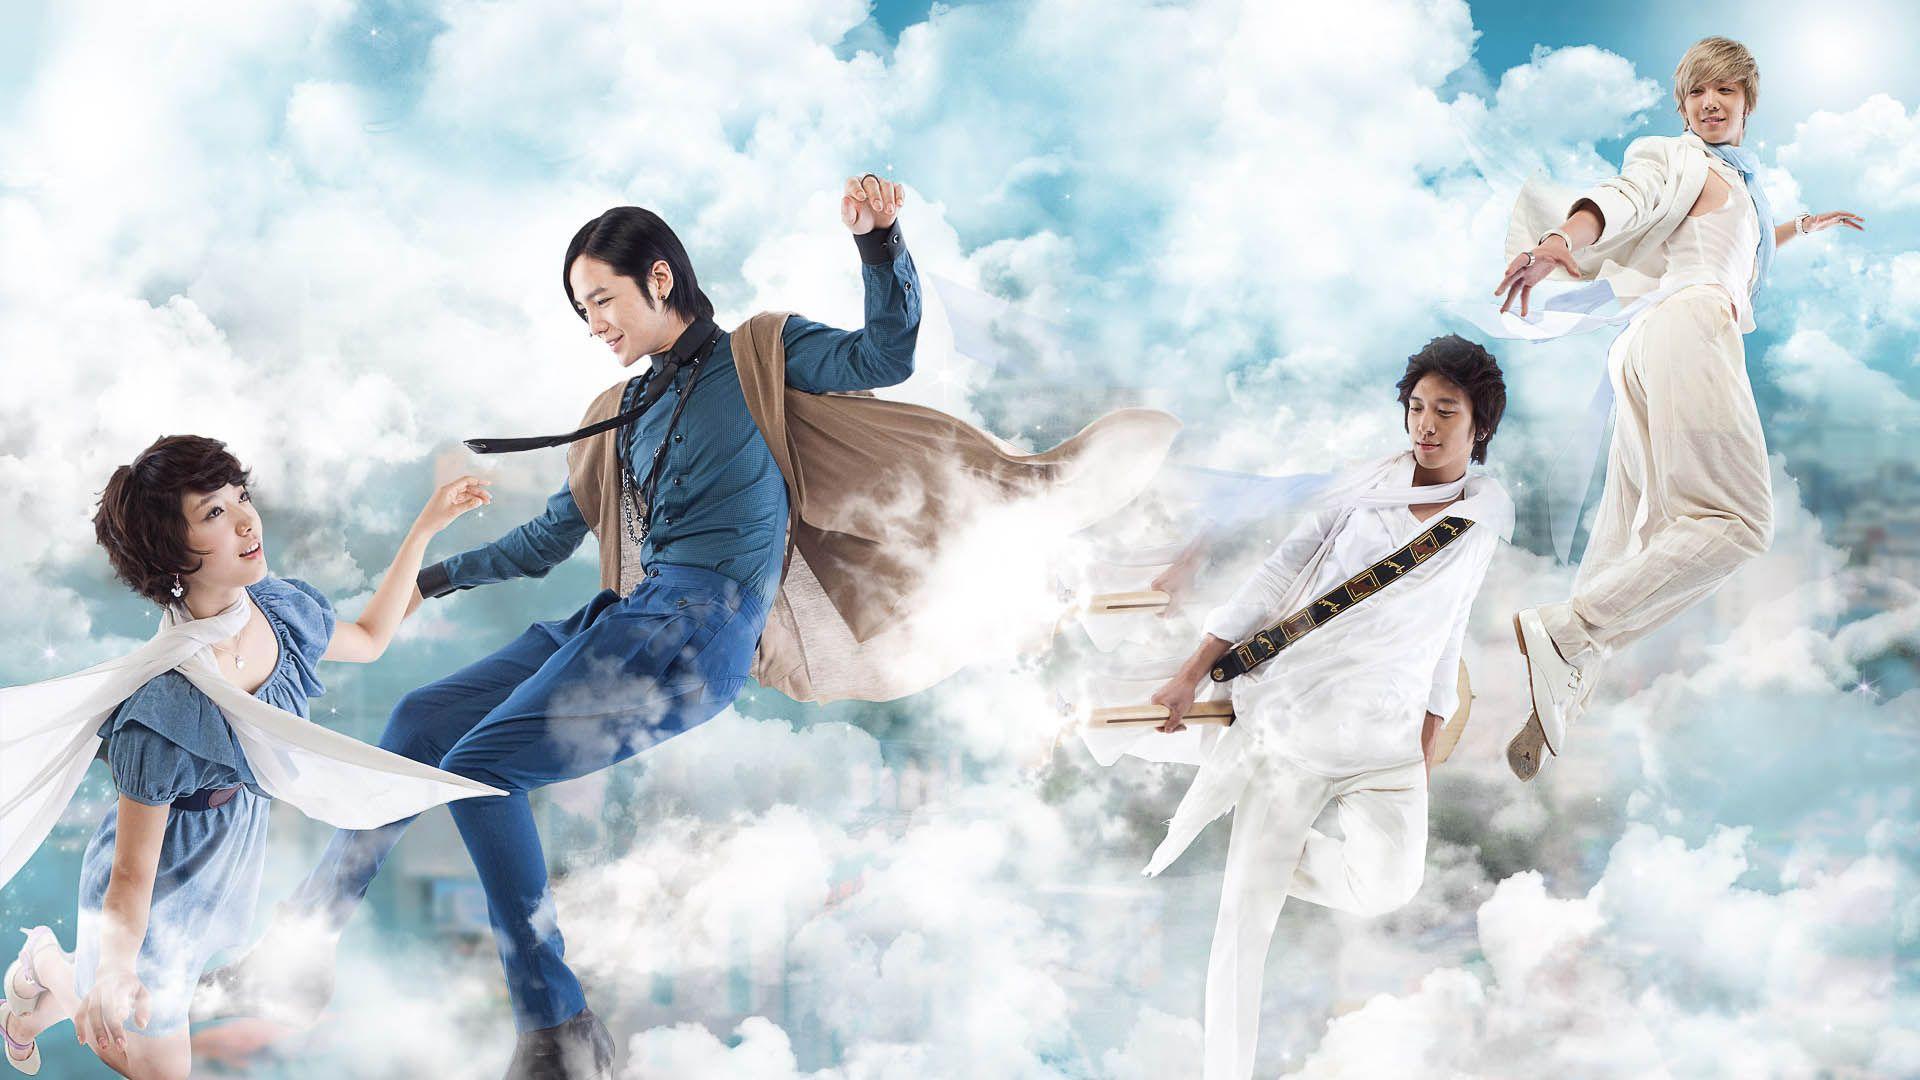 You Re Beautiful Korean Drama Wallpapers Top Free You Re